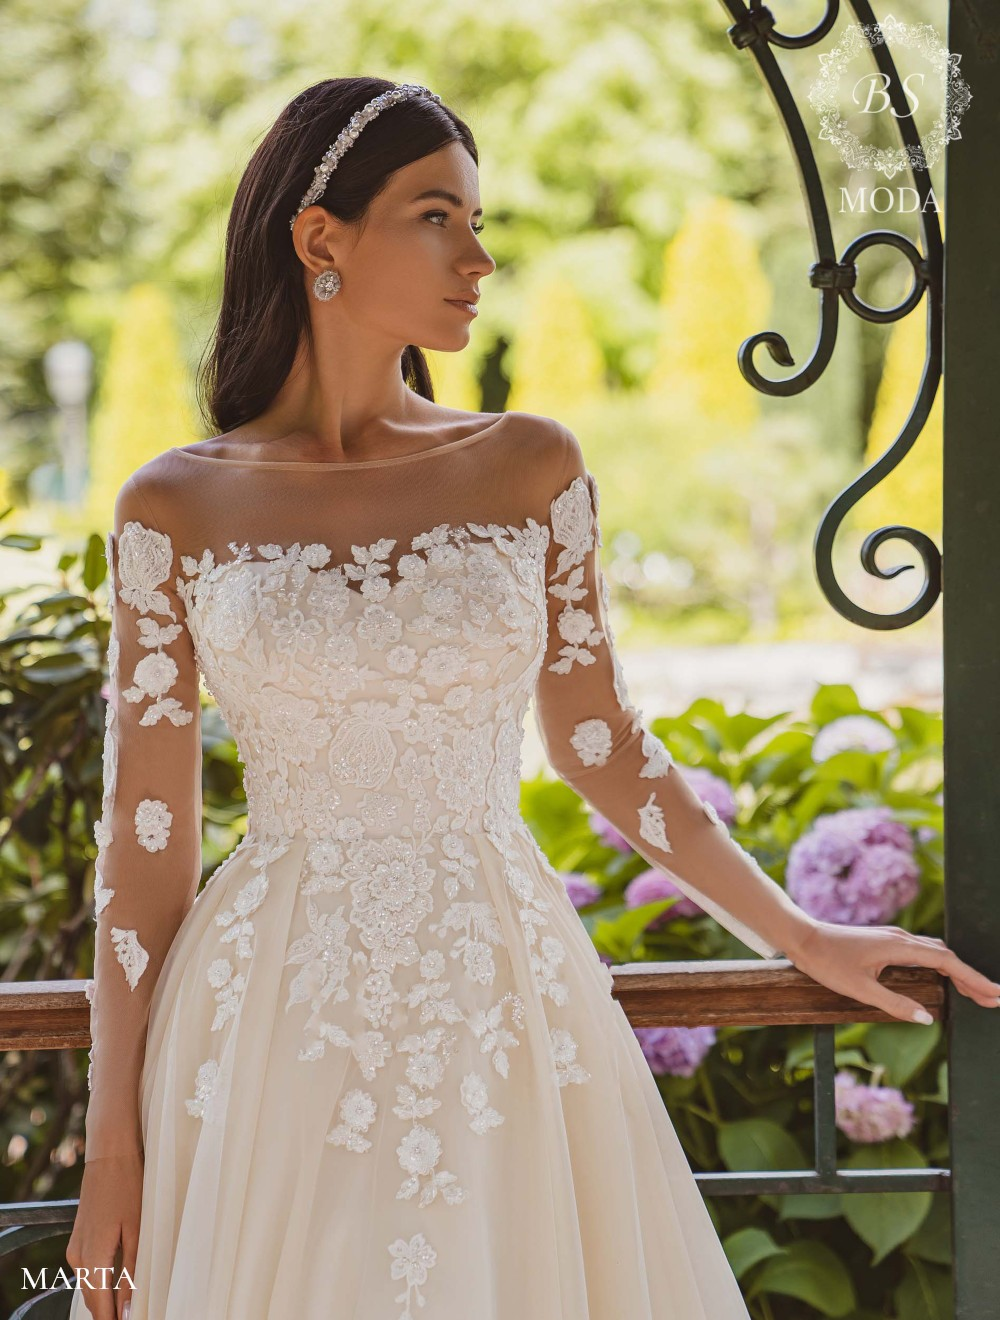 Marta wedding dress